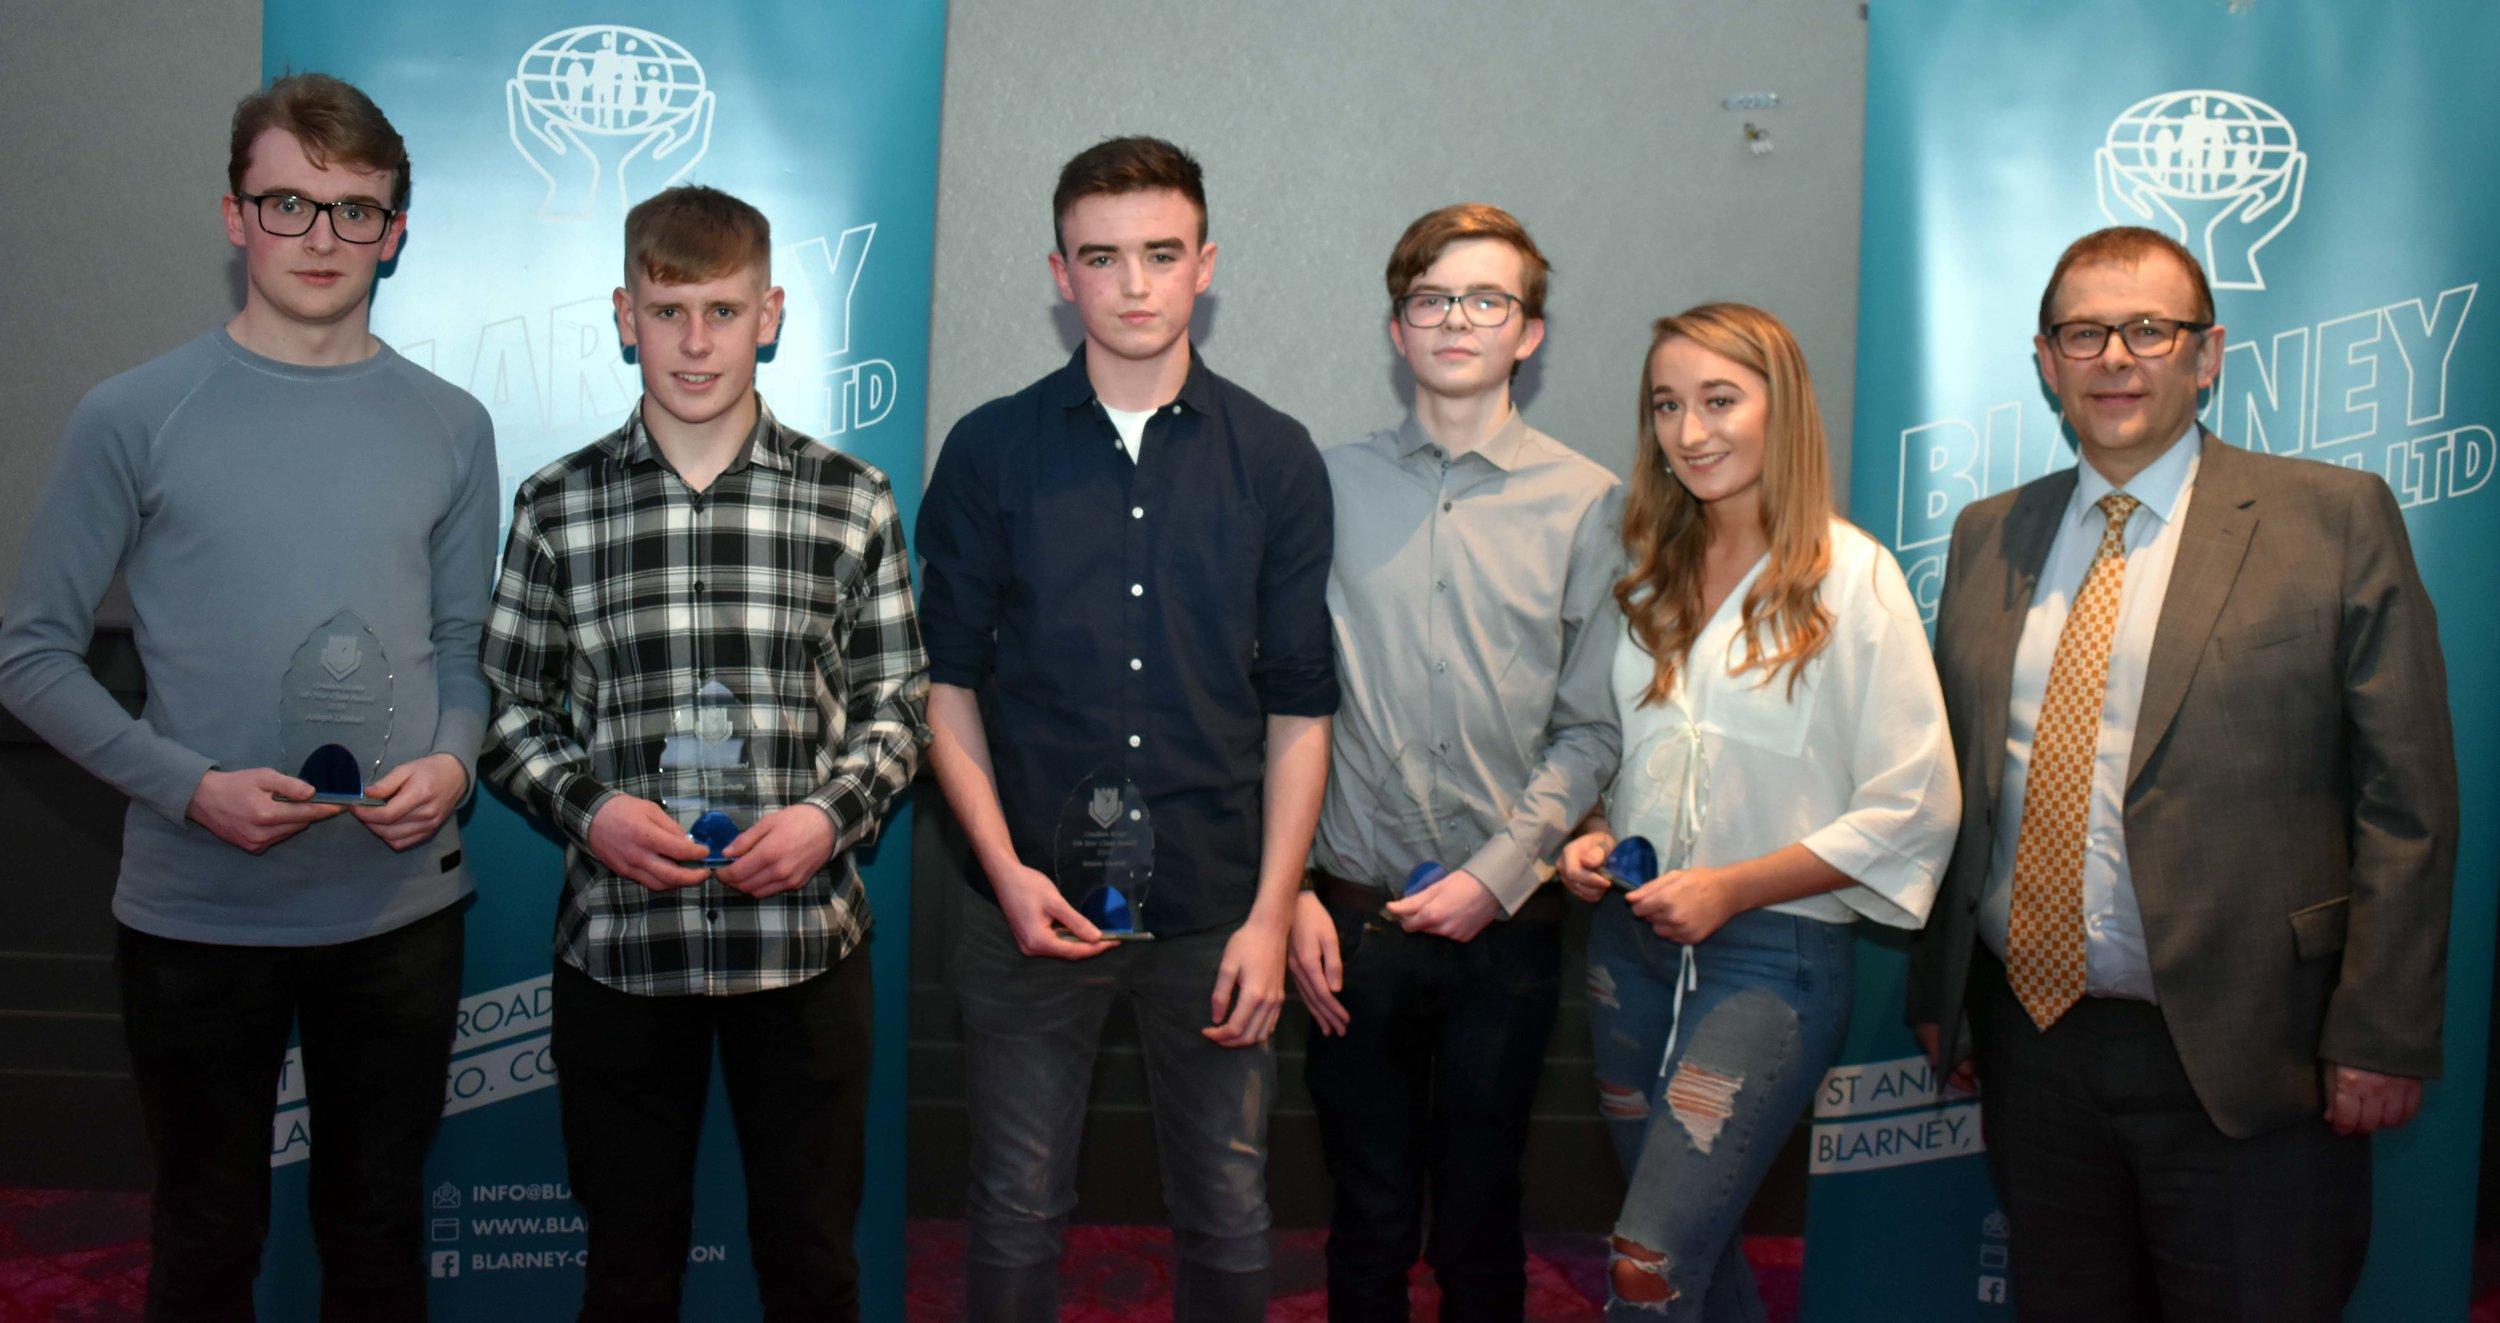 6th Year Class Award Winners: Joseph Linehan, Ryan Frayne- Duffy, Shane Carroll, Aaron Dorney, Sophie Williams. (Pictured with Mark McGloughlin - BOM and Blarney Credit Union)